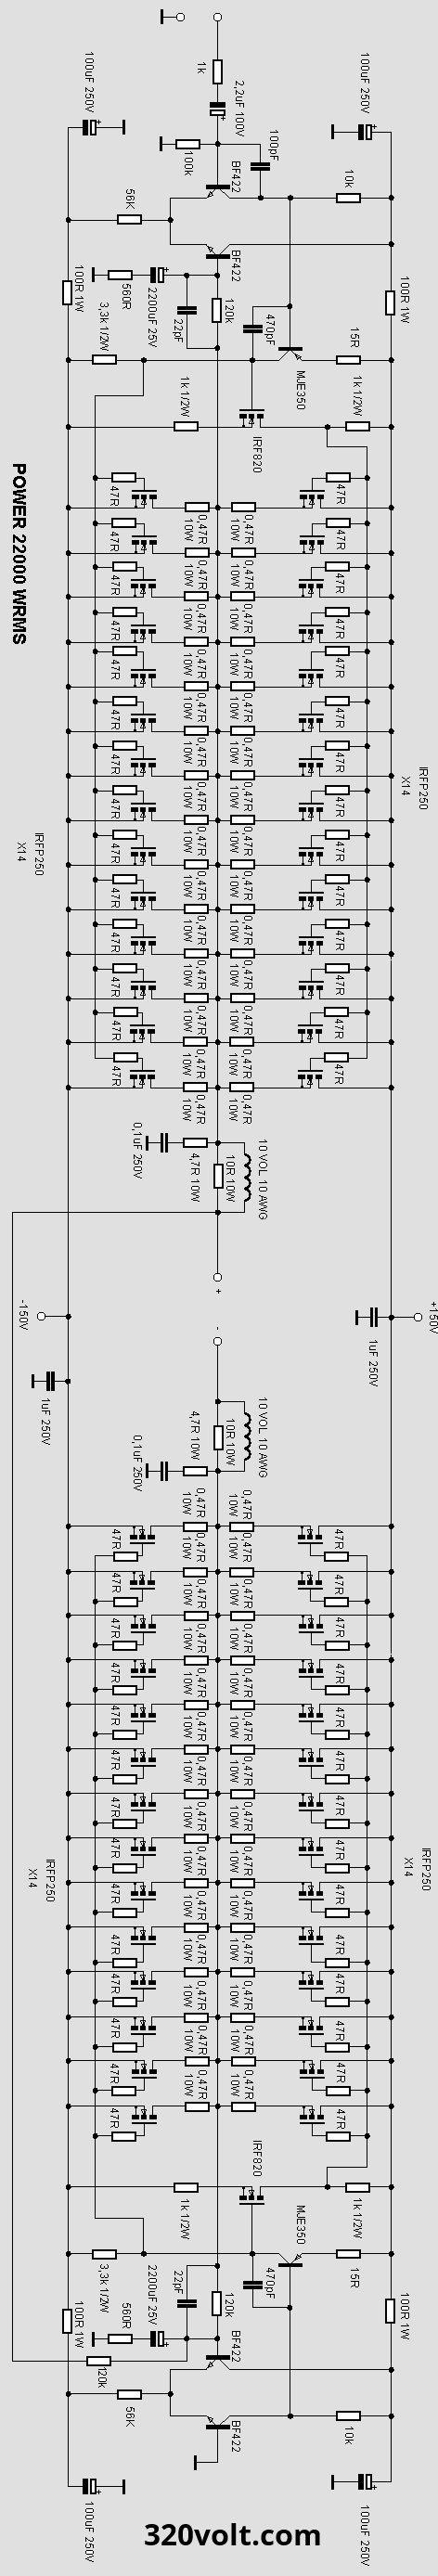 2200w Amplifier Circuit Mosfet 250 Diagram Images Watt Audio Power Schematic High Transistor Circuits